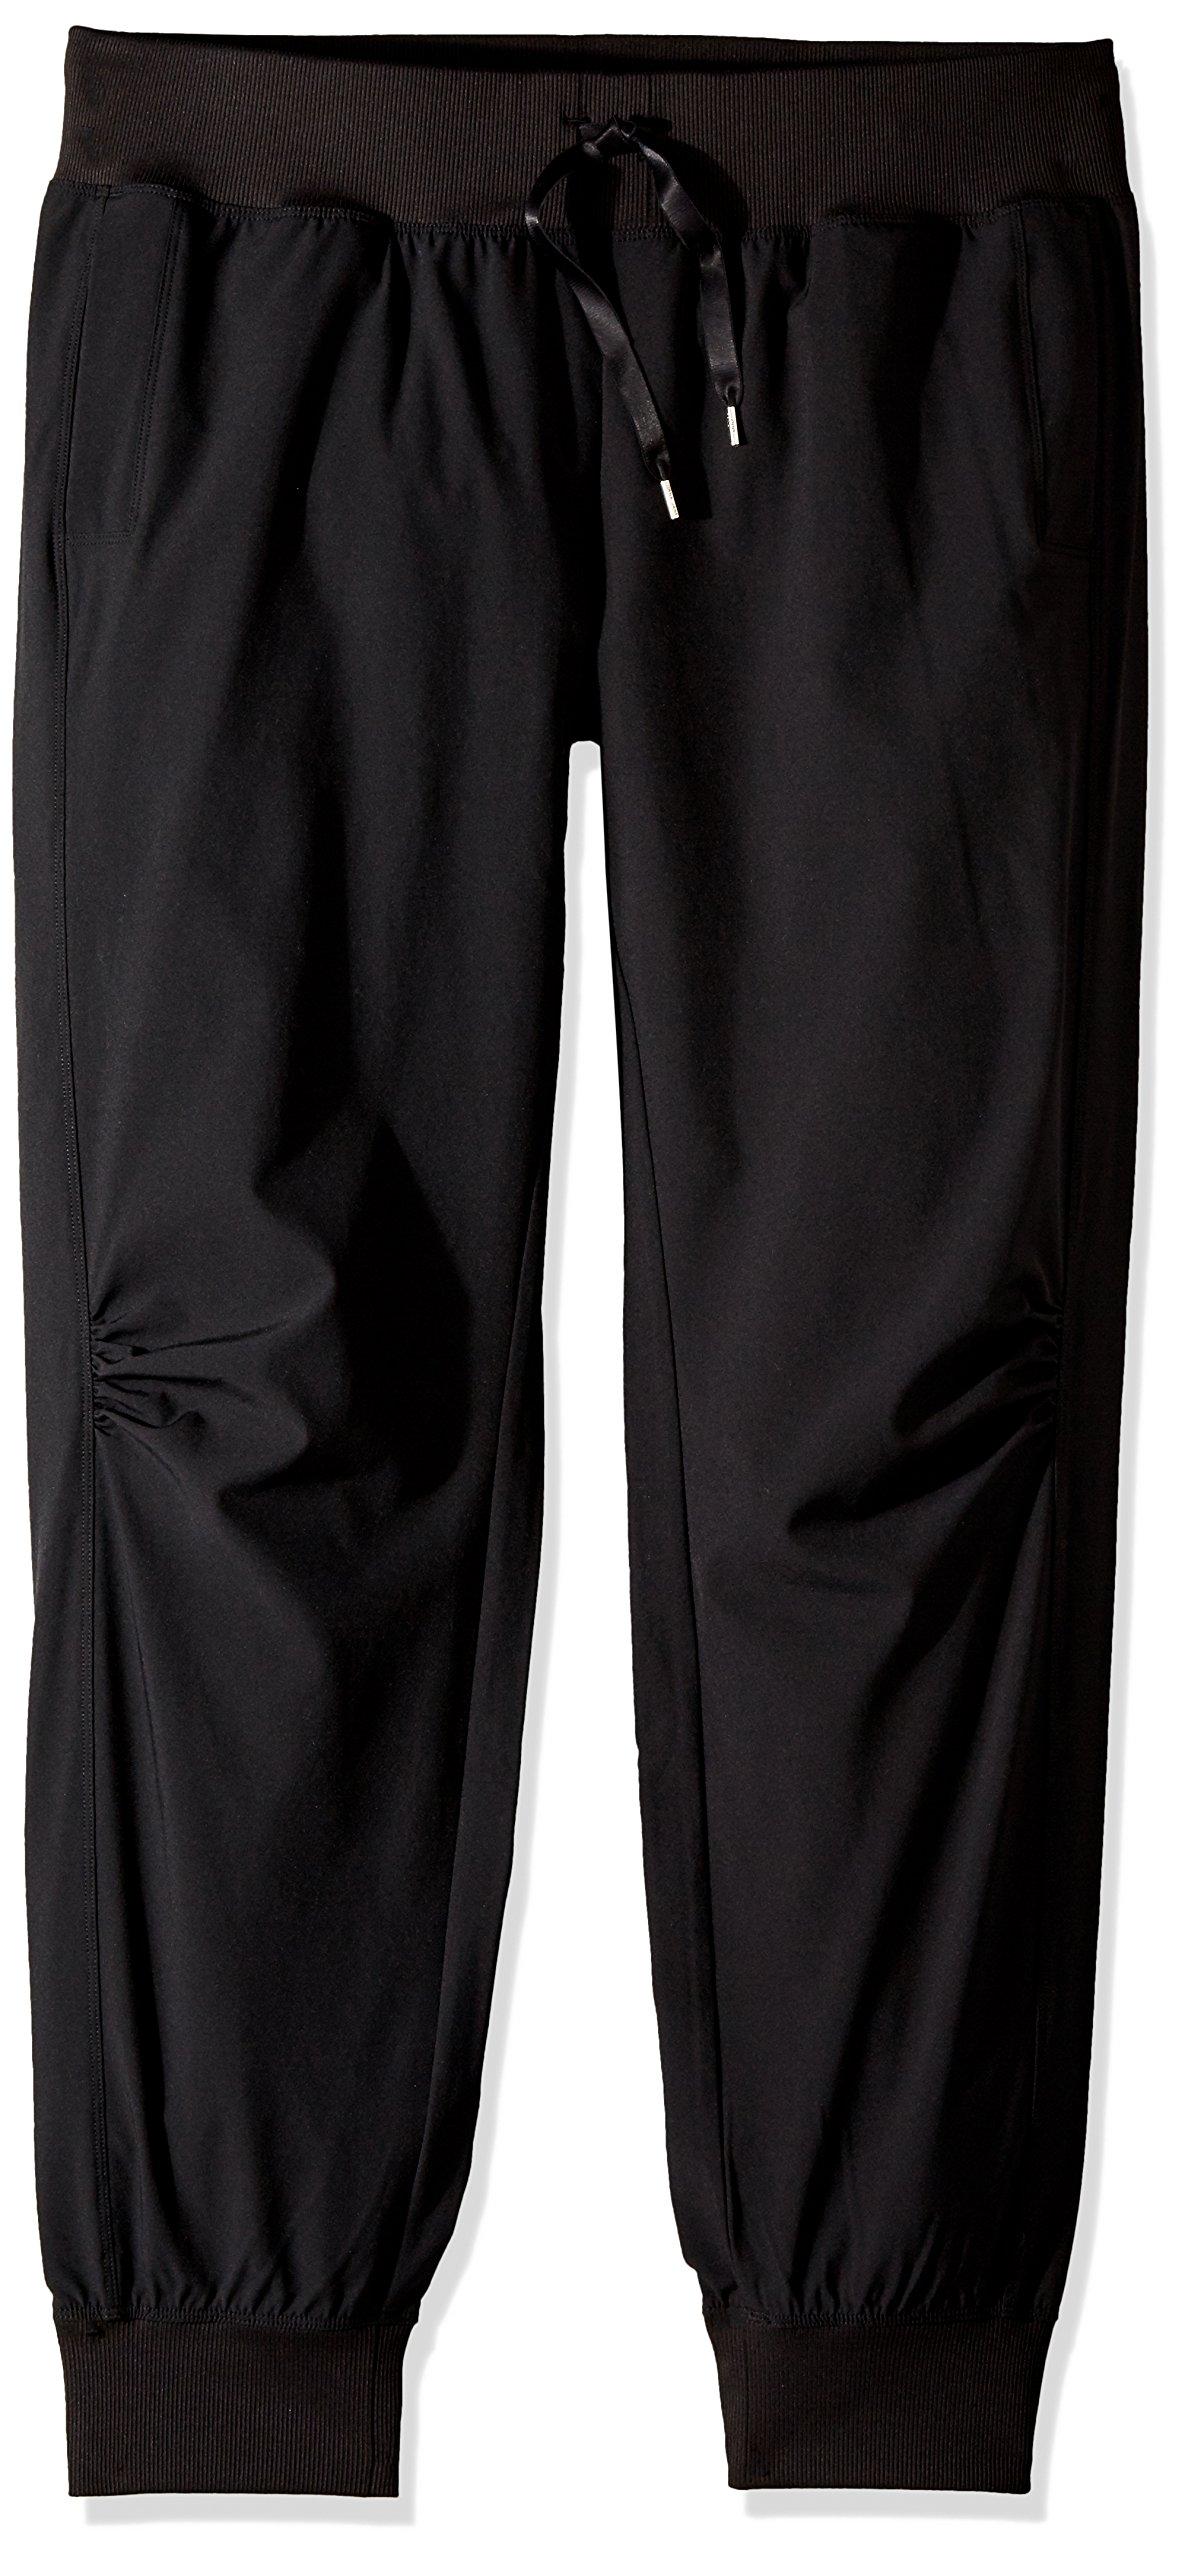 Lorna Jane Womens Studio Active Pant, Black, X-Large by Lorna Jane